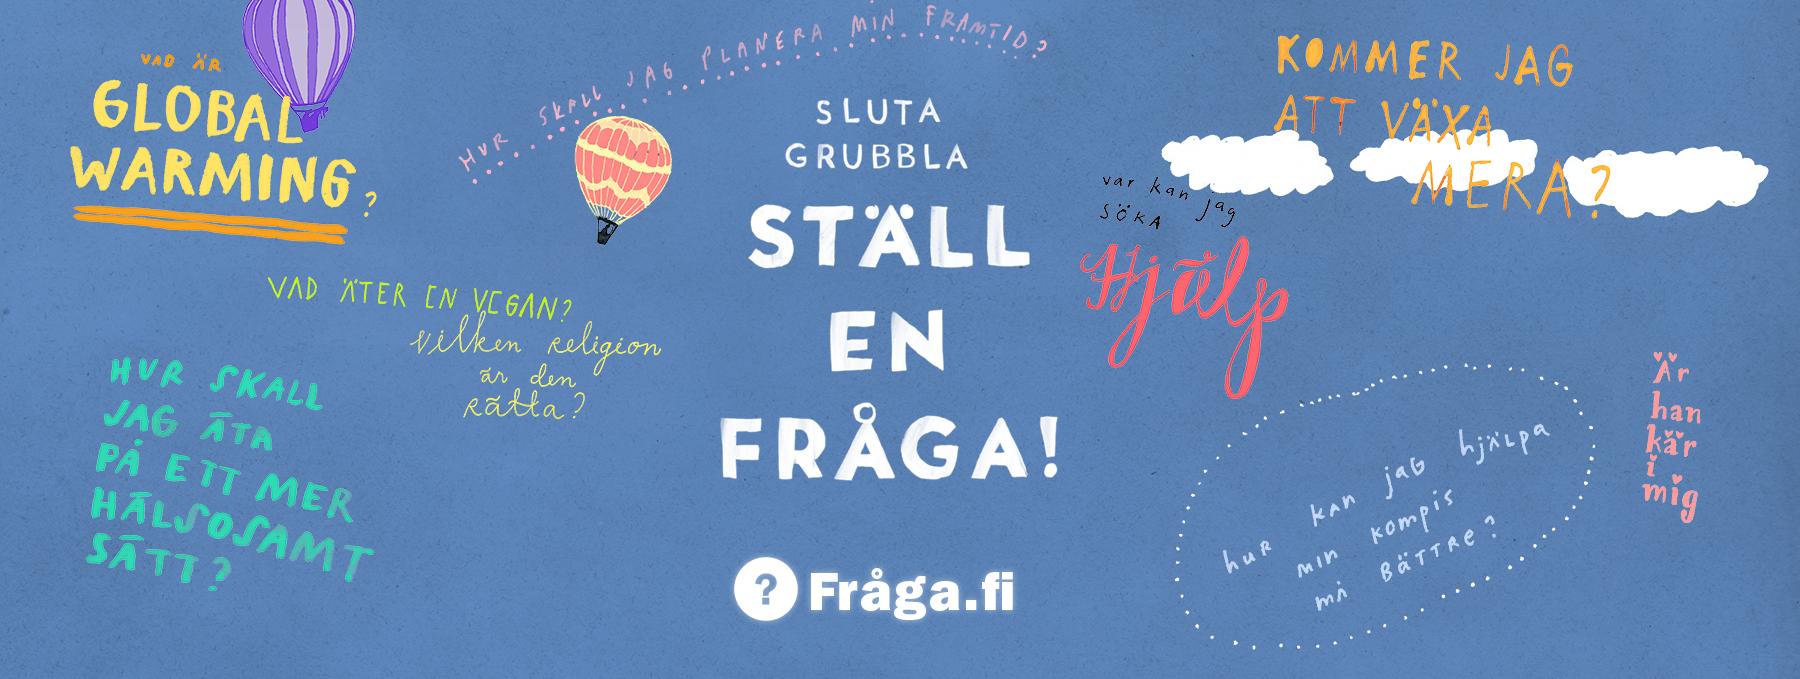 fraga_banner-1800x679